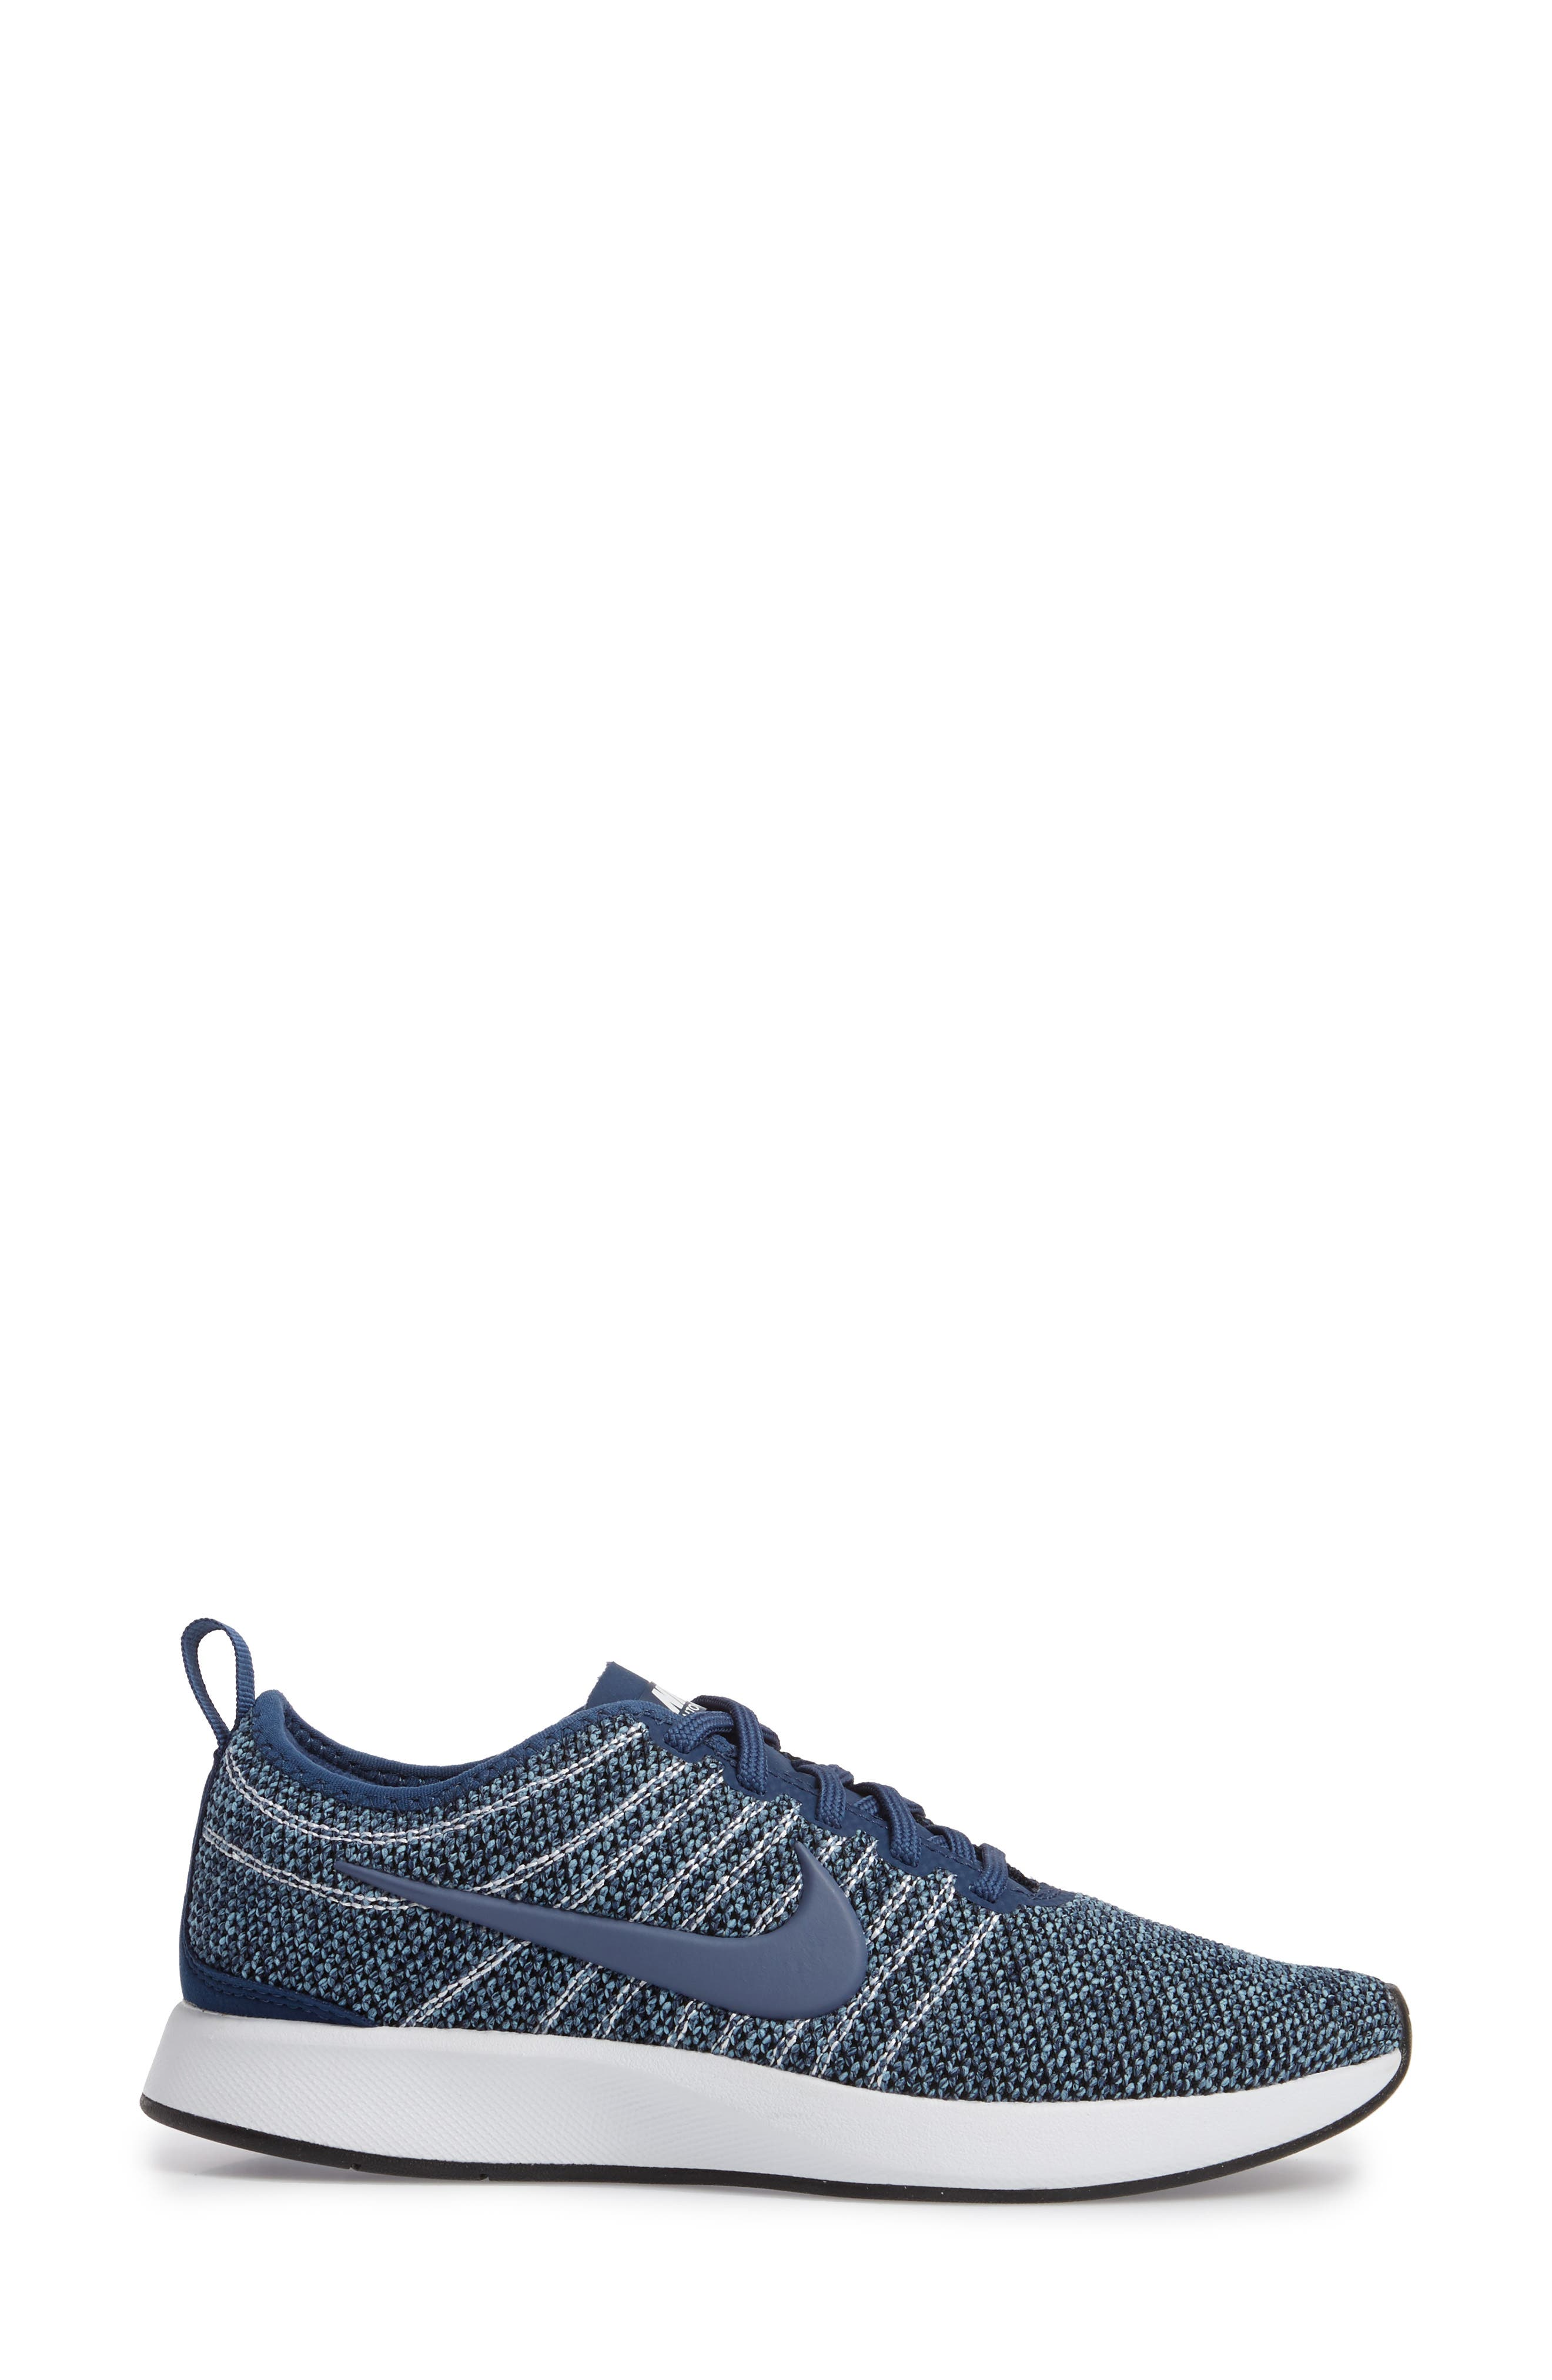 Dualtone Racer PRM Sneaker,                             Alternate thumbnail 3, color,                             Navy/ Diffused Blue